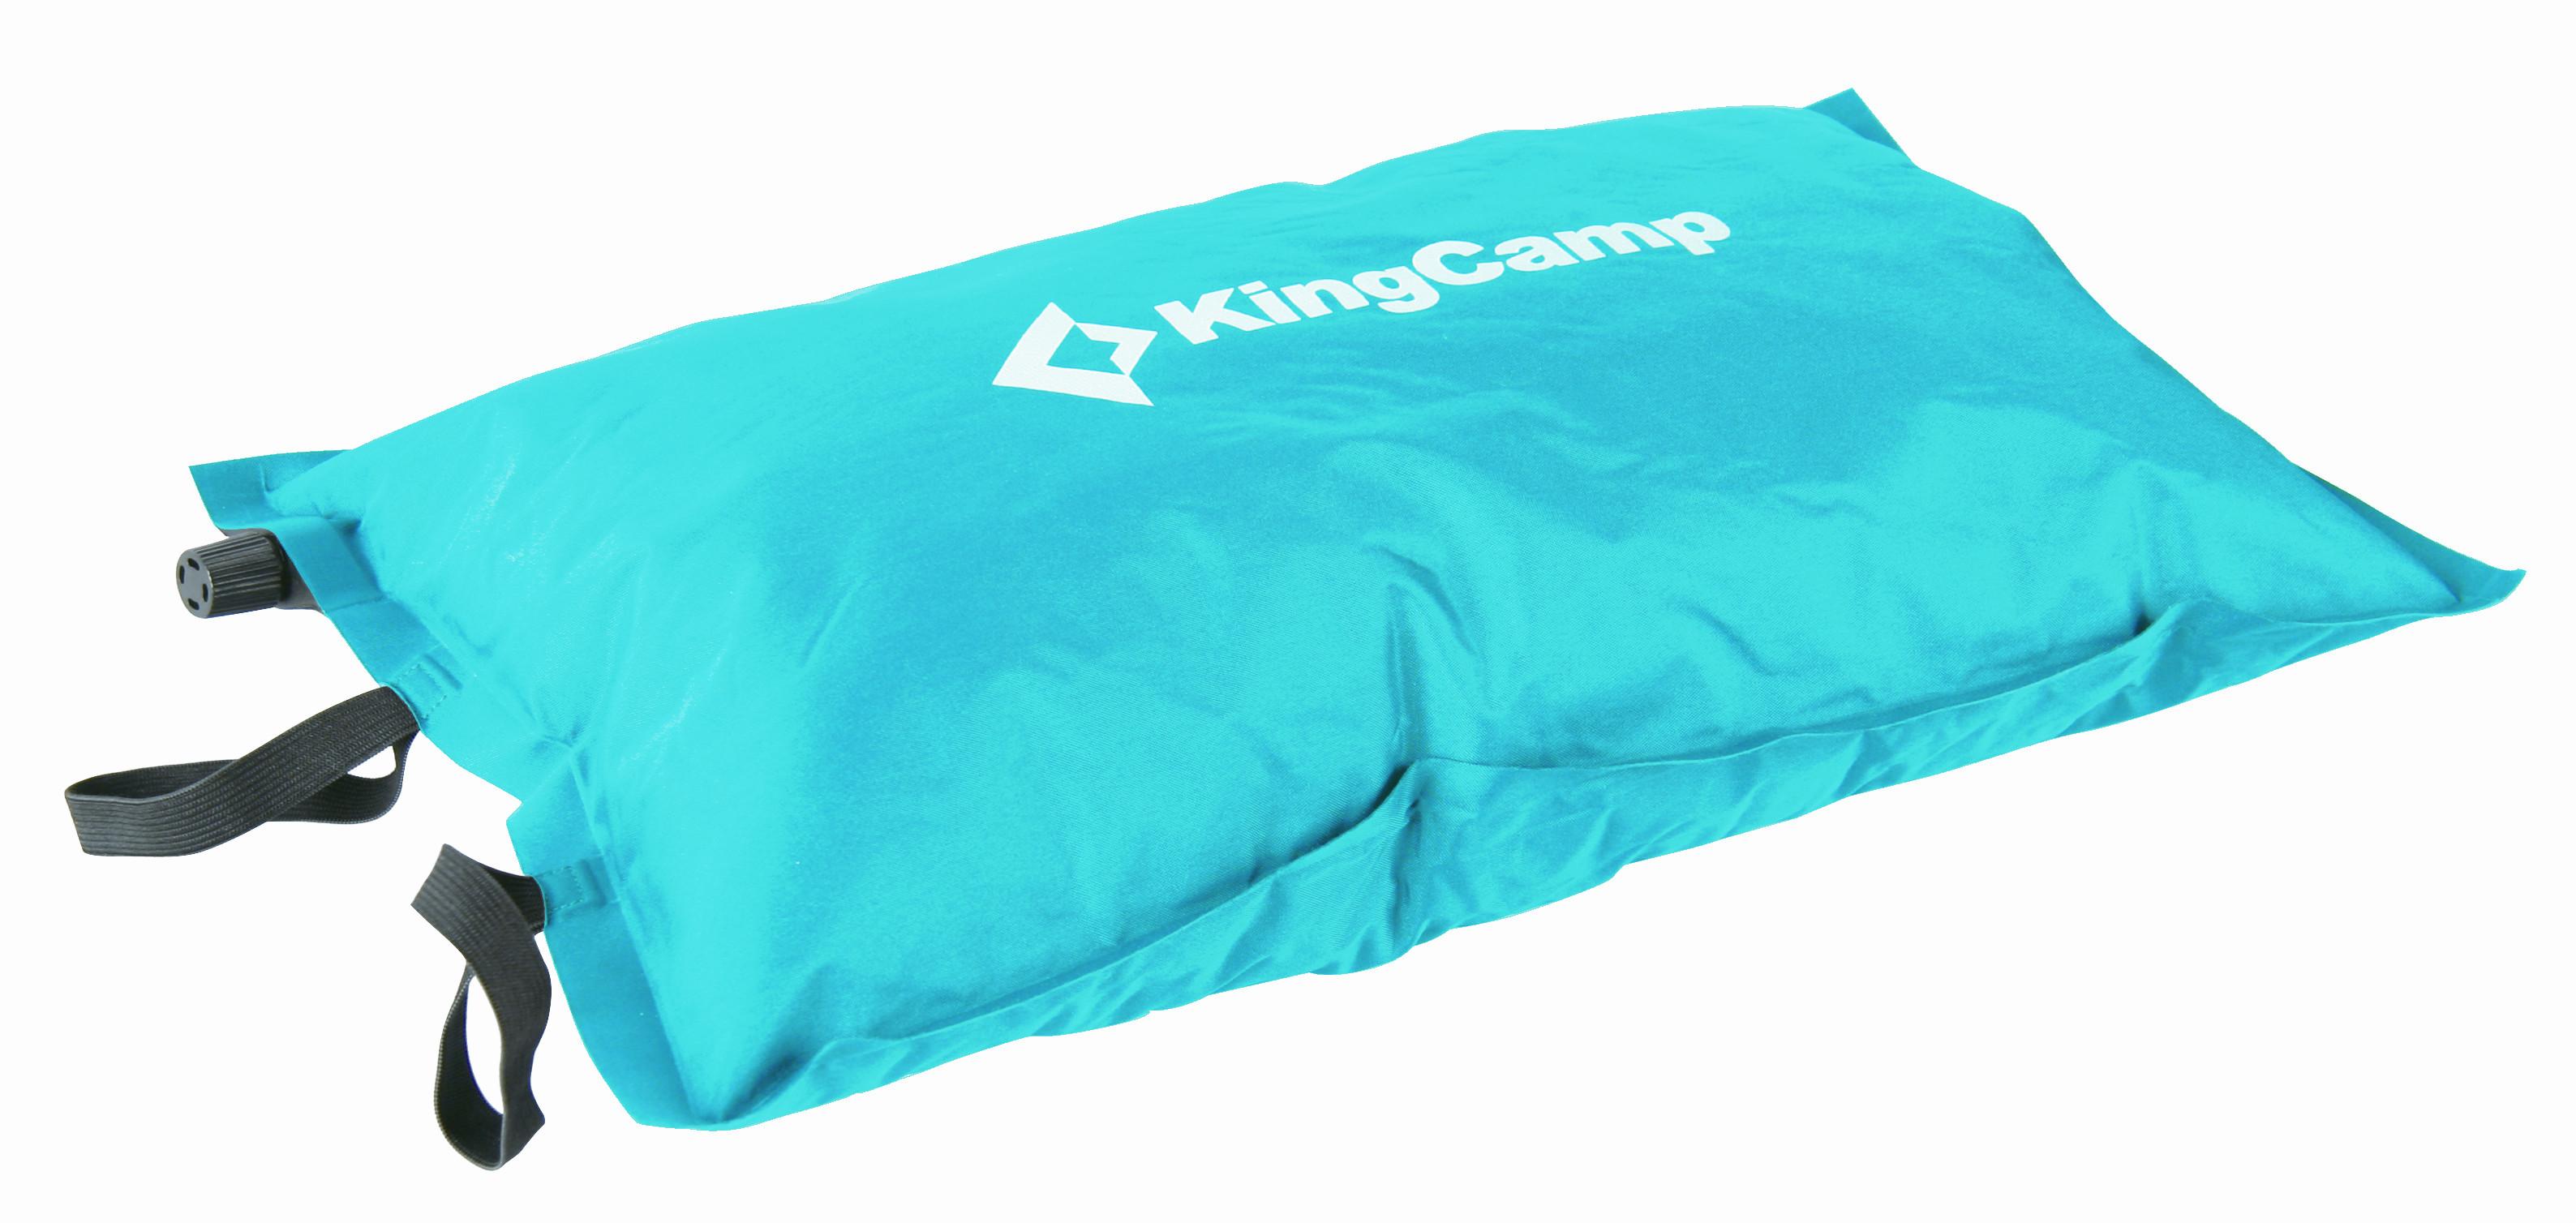 Подушка King camp